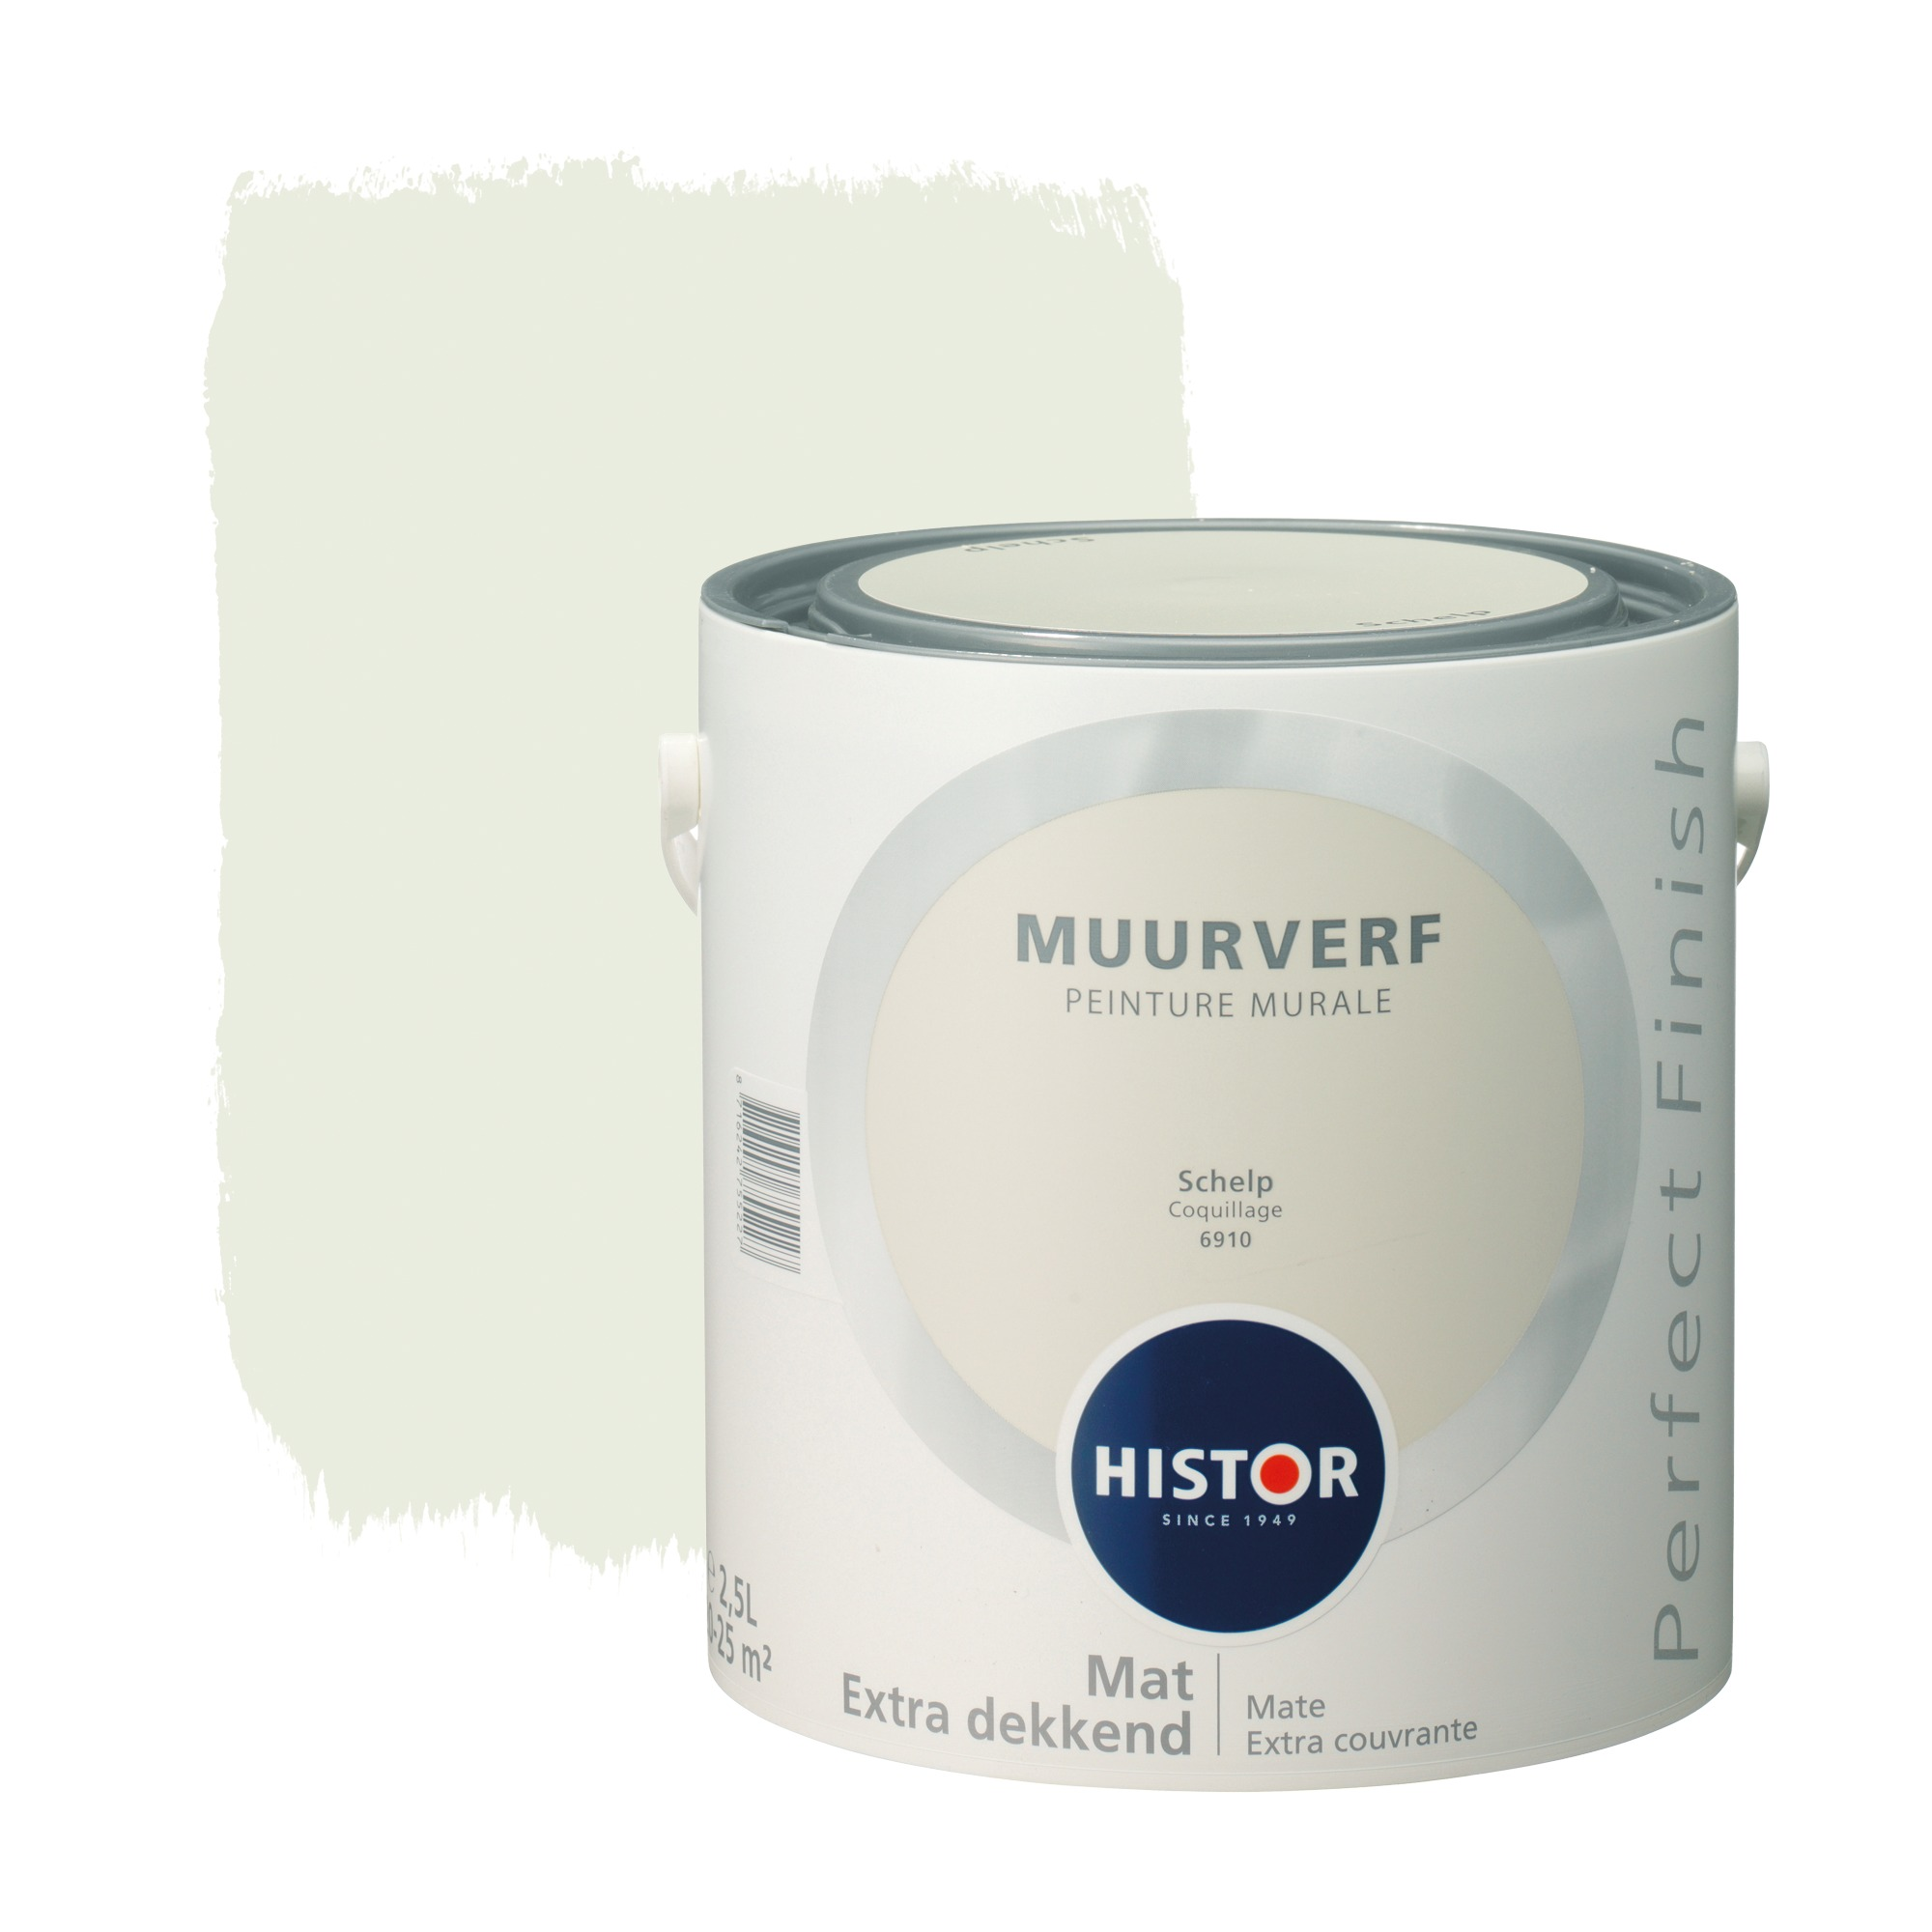 Histor perfect finish muurverf mat schelp 6910 2,5 l